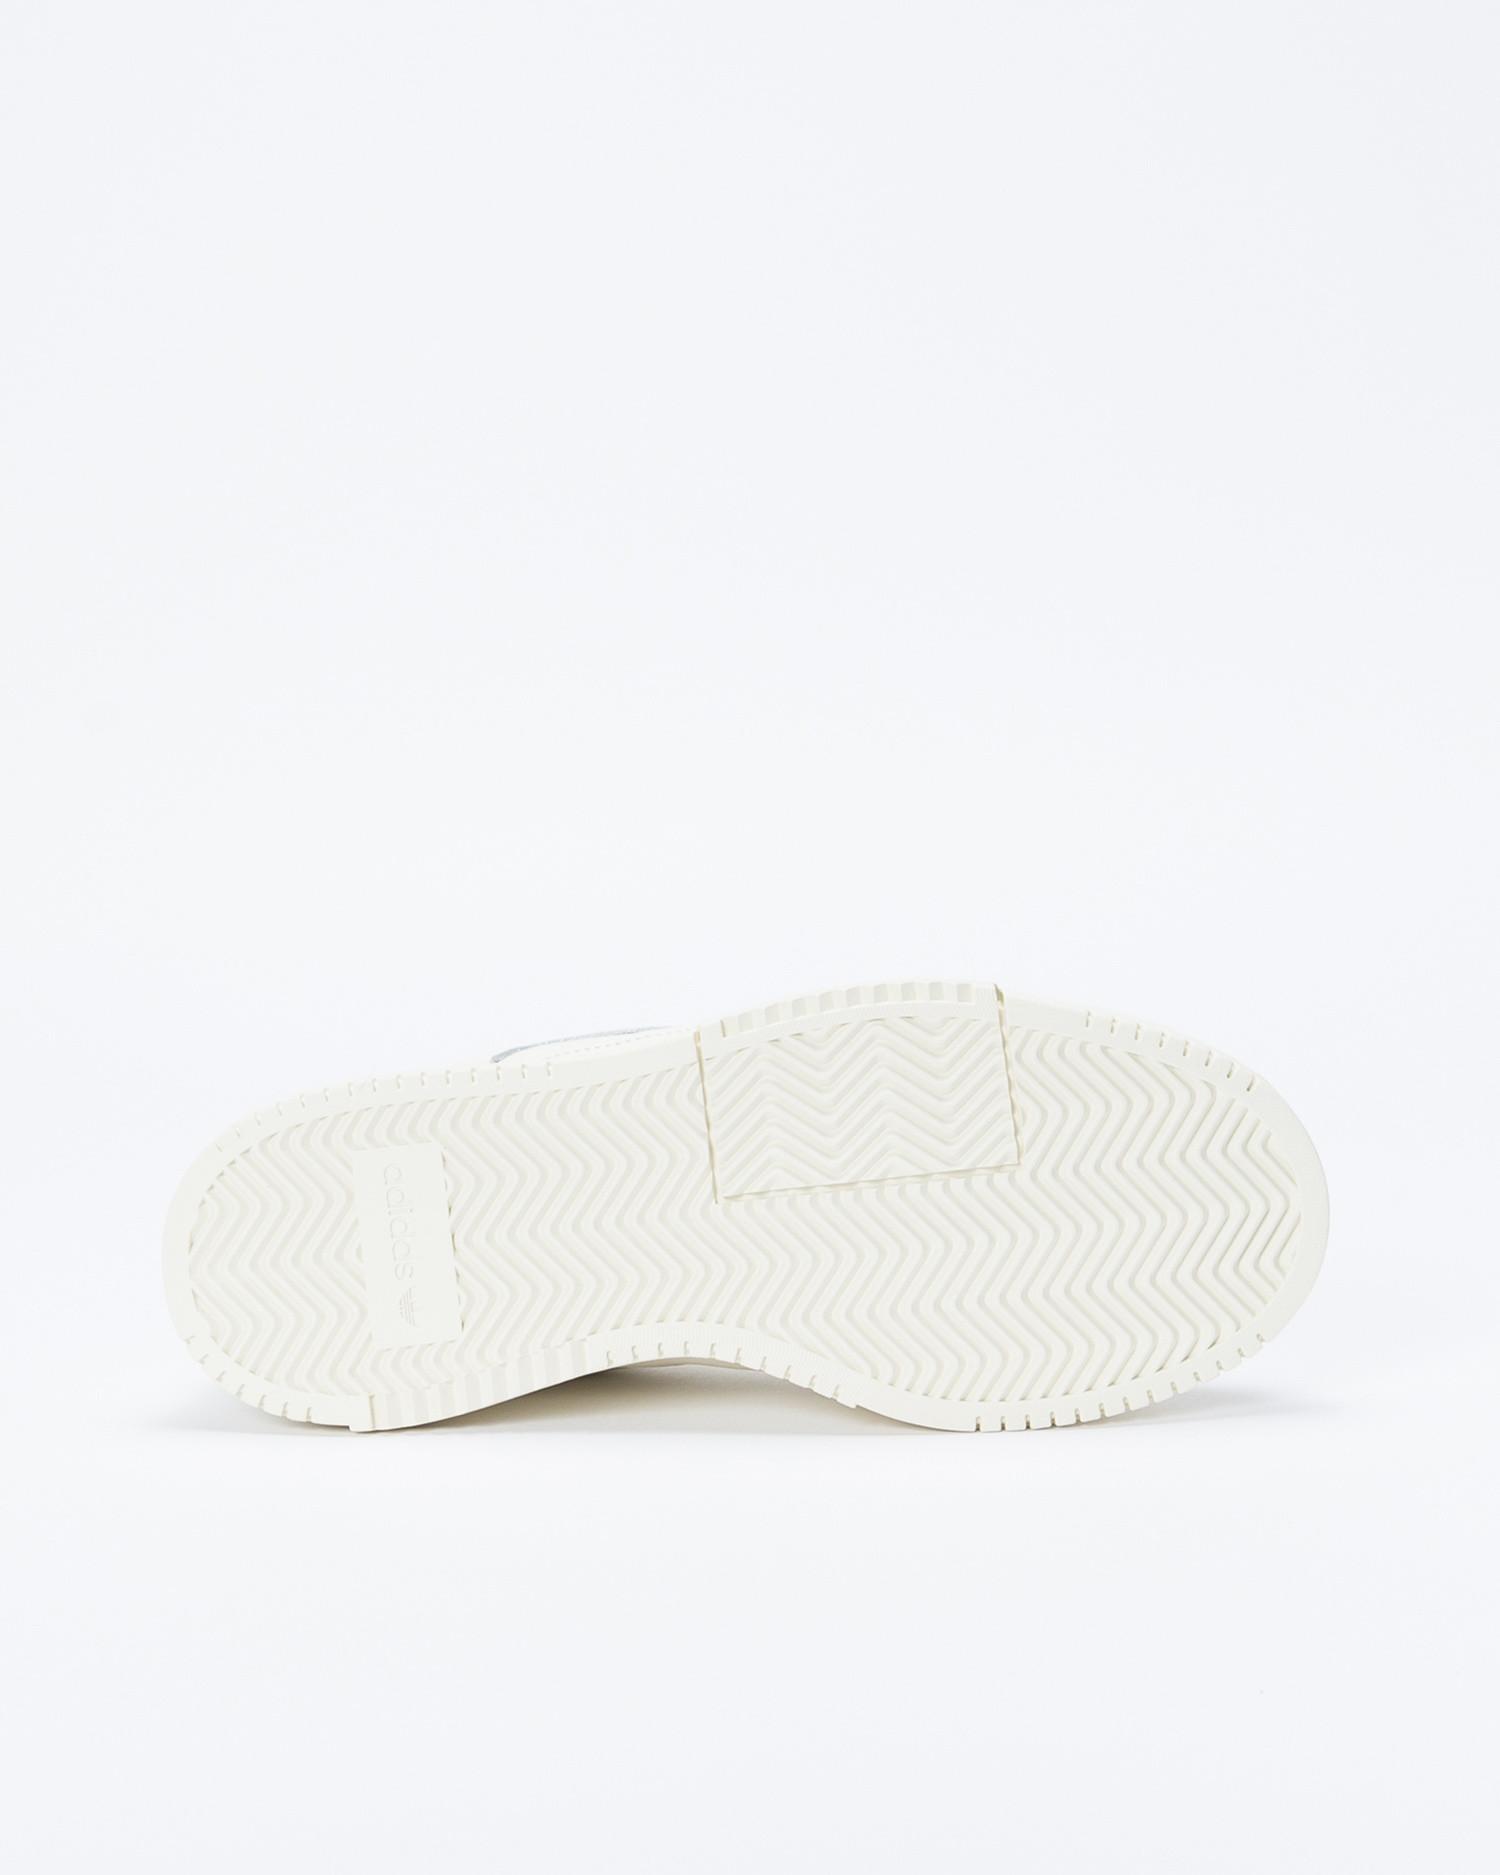 Adidas SC Premiere off white